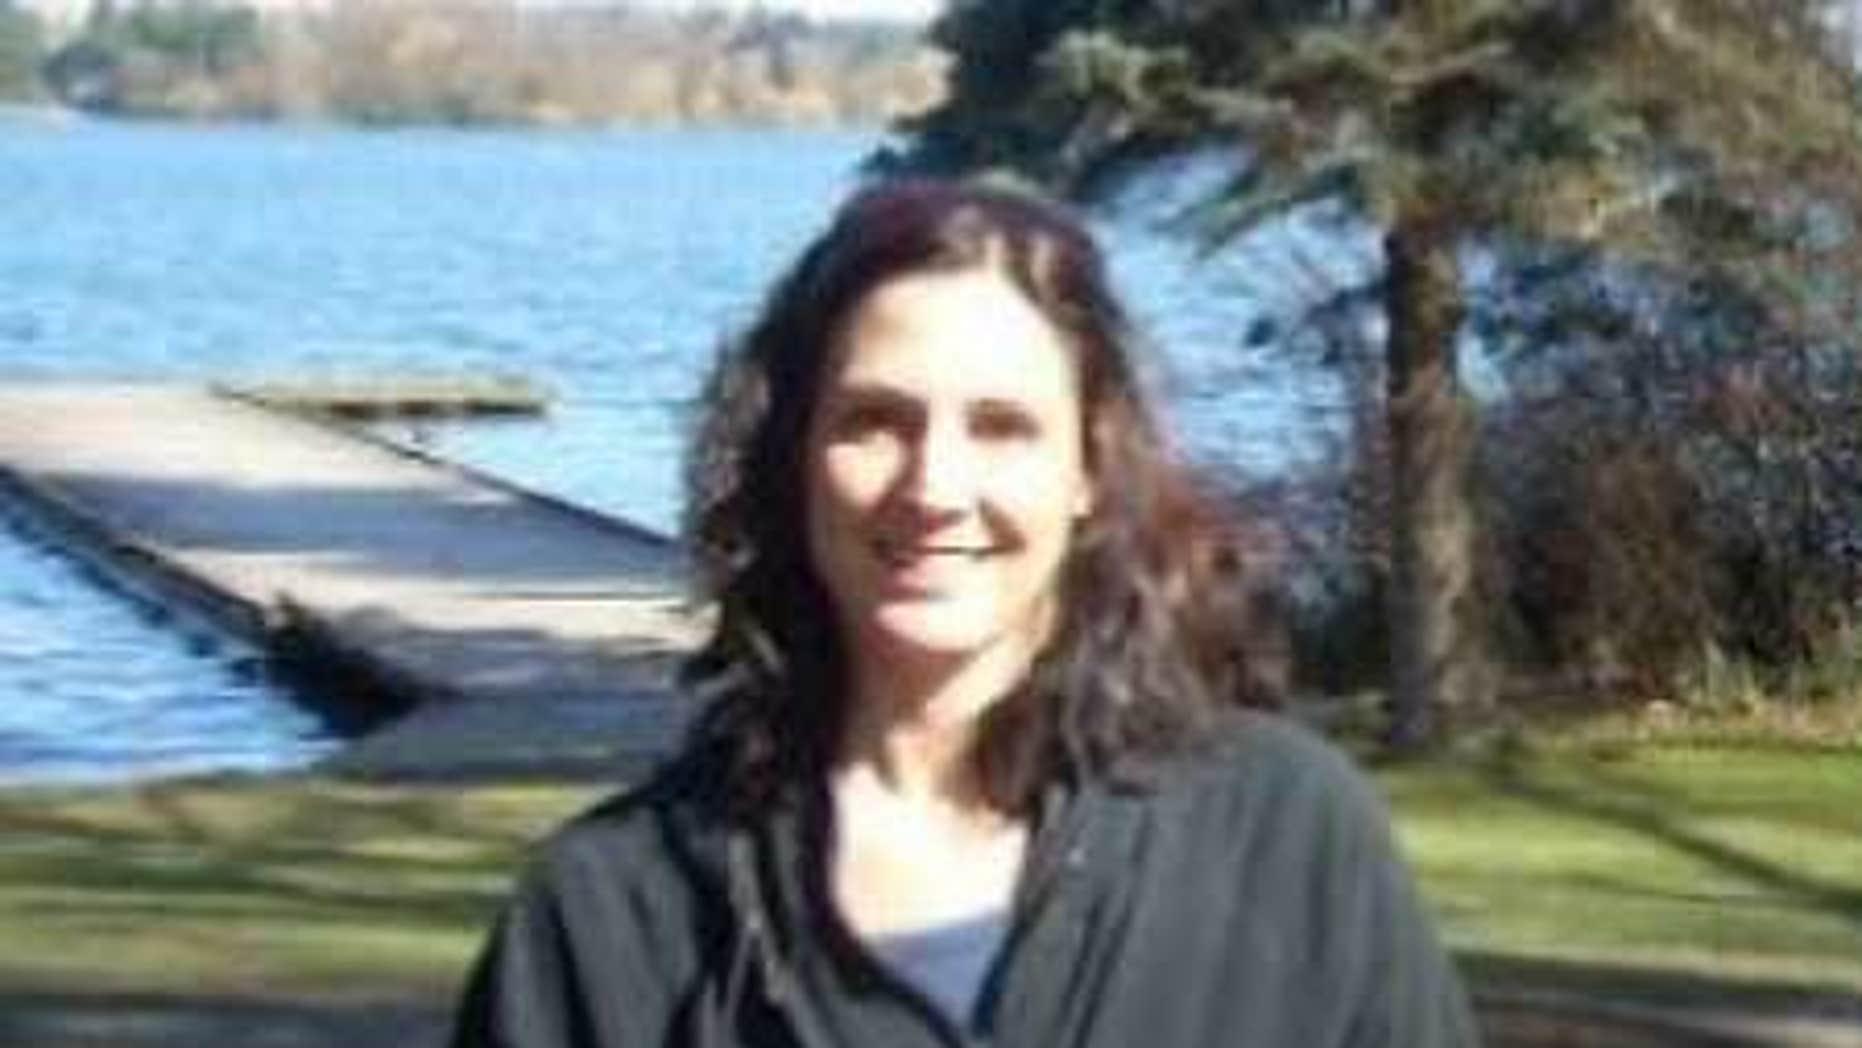 Amber Malkuch